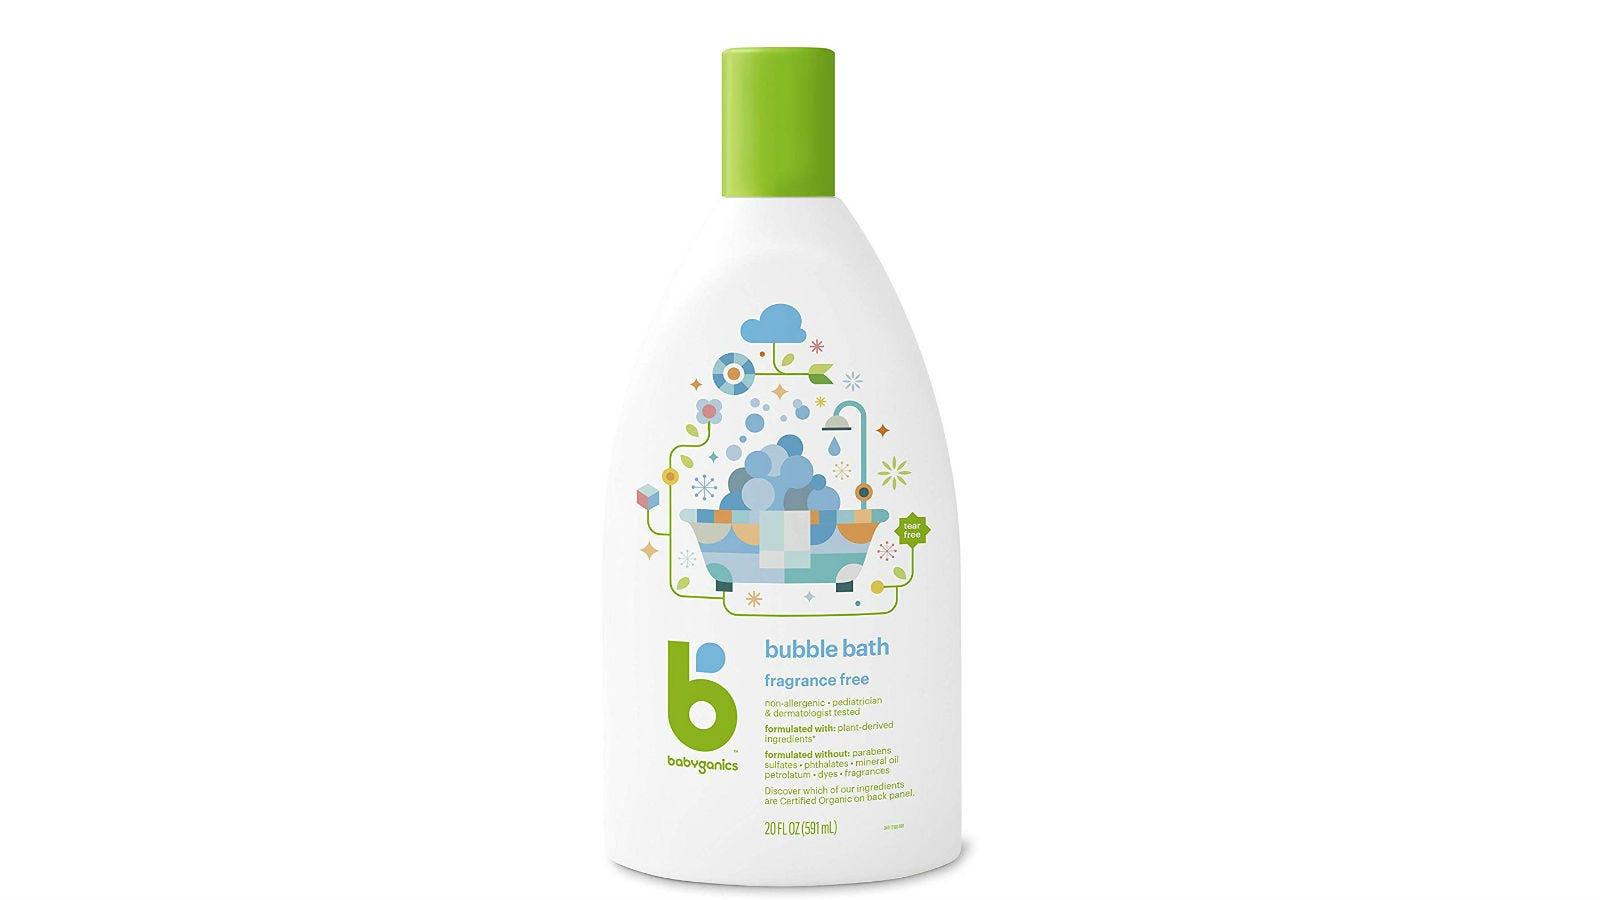 A bottle of BabyGanics Bubble Bath.